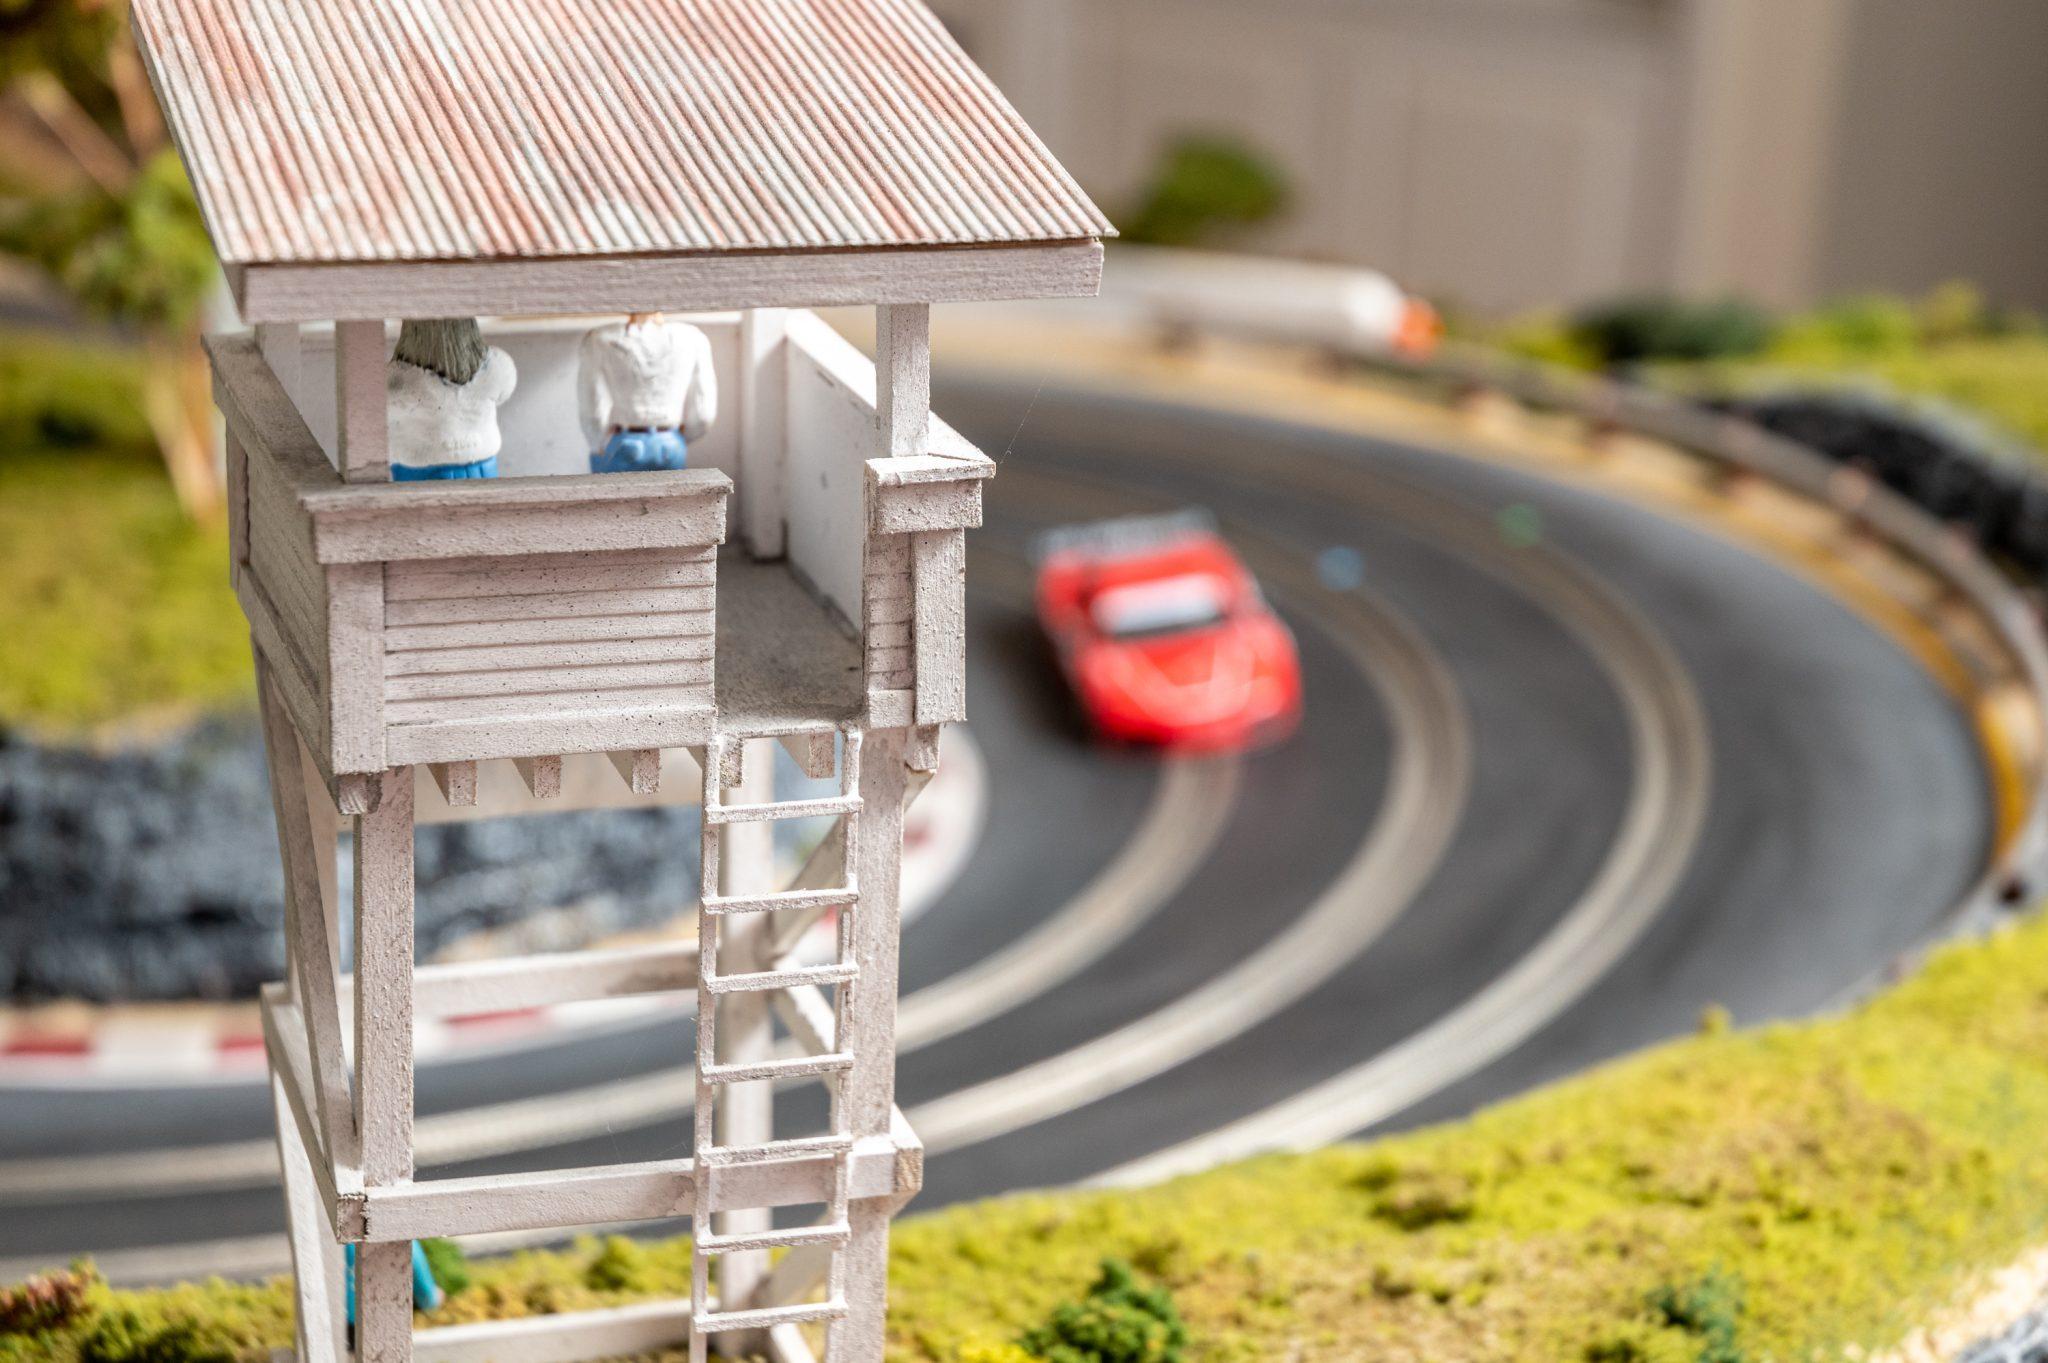 Slot Car Racetrack cornering watch tower detail